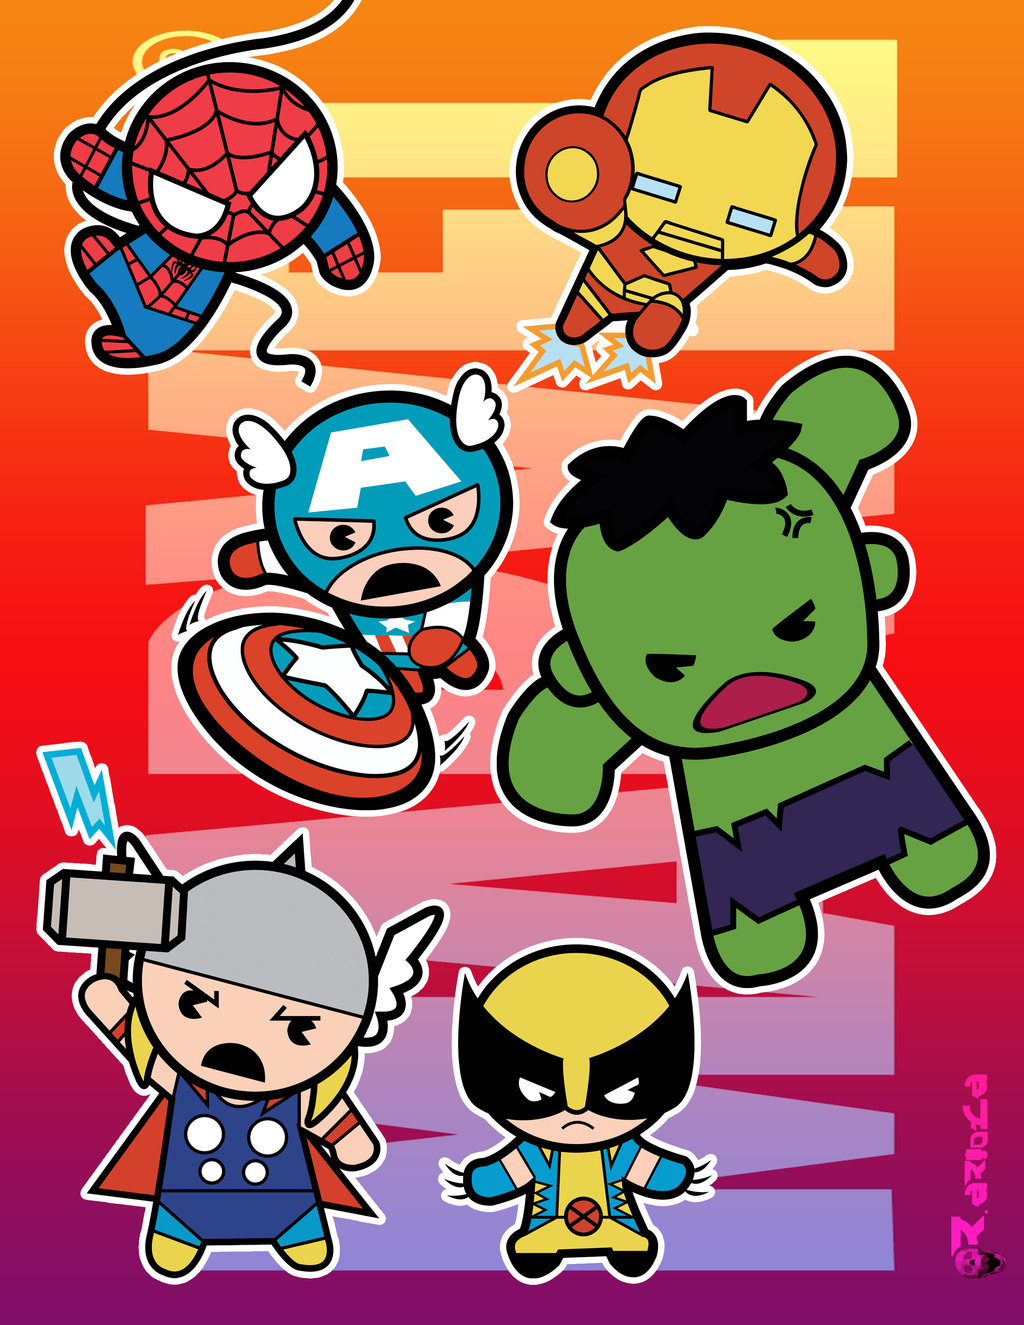 Marvel Super Heroes 60 Superhéroes: Super Héroes Marvel En Versión Chibi.